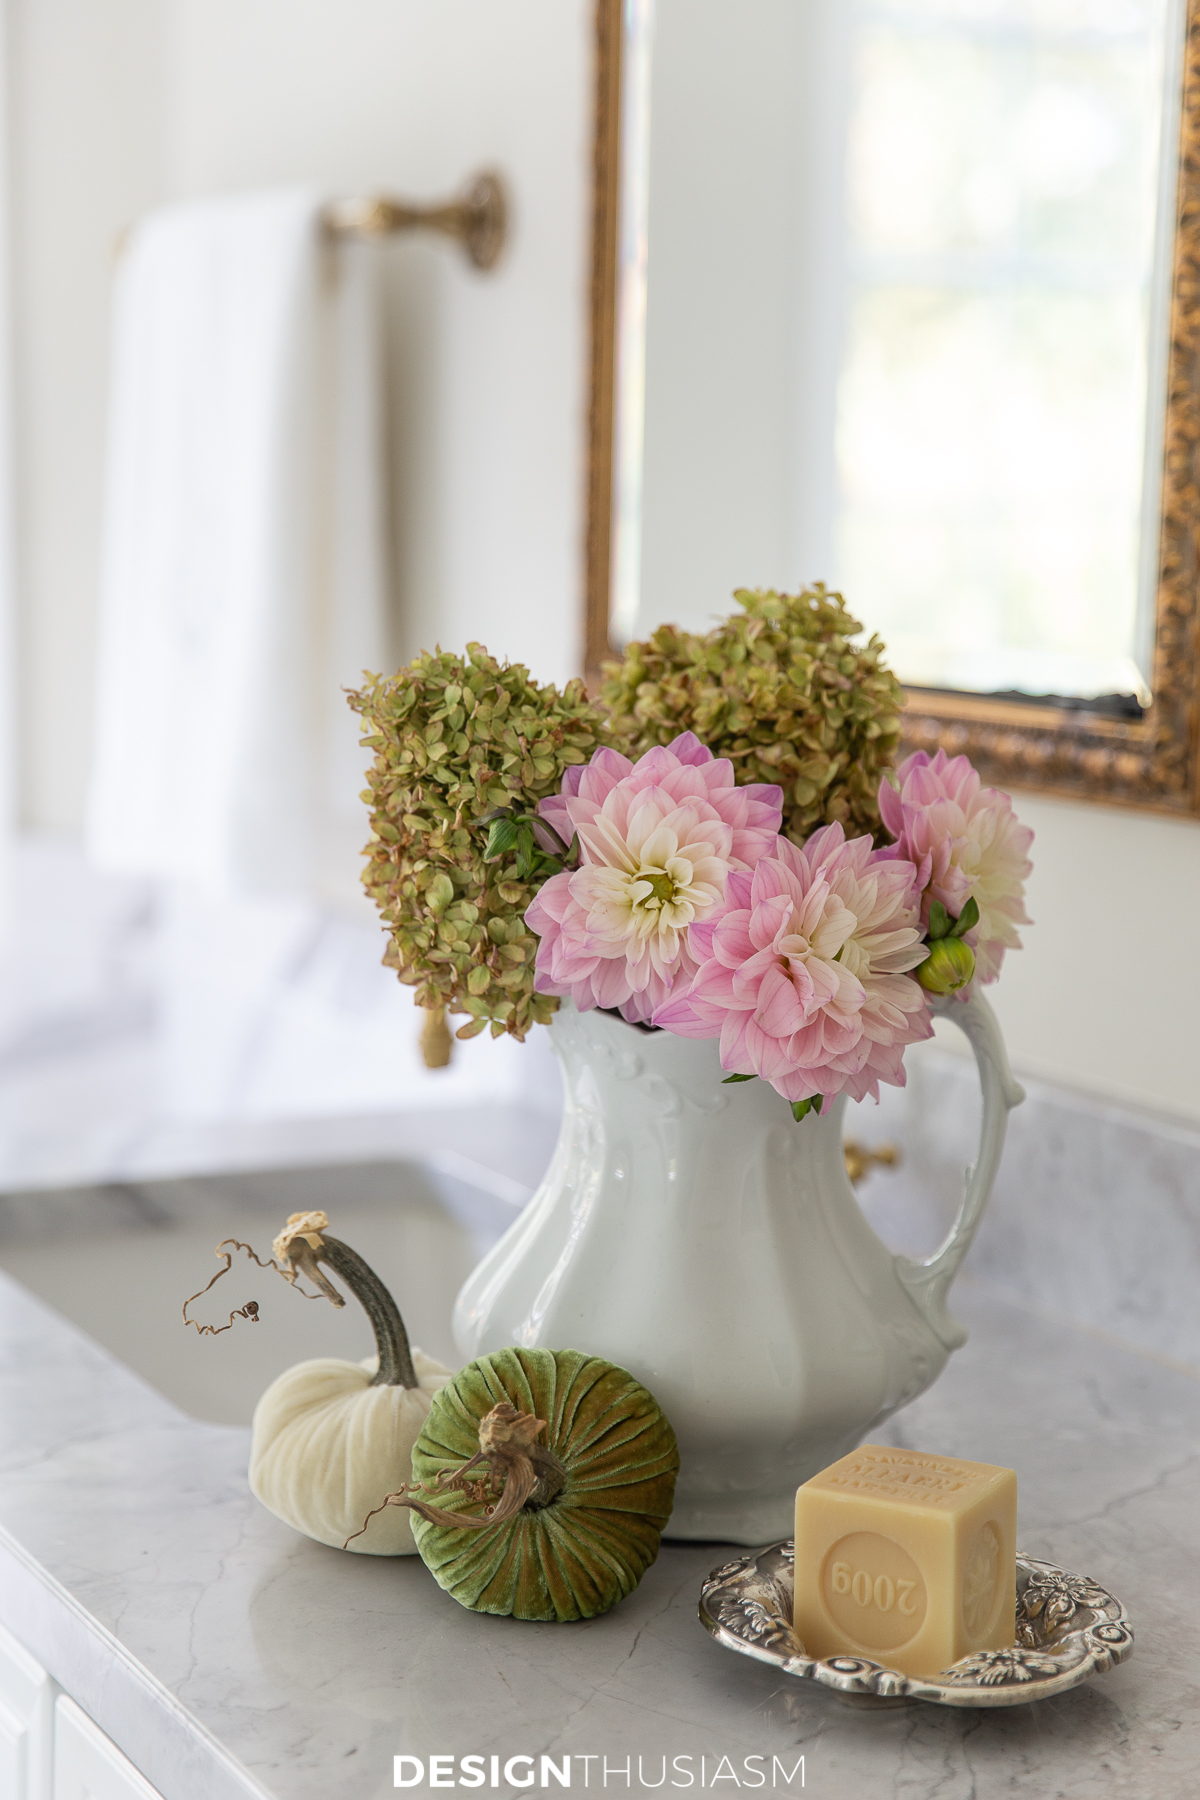 Fall Bathroom Decor: Easy Ways to Add Autumn Decor to Your Bathroom